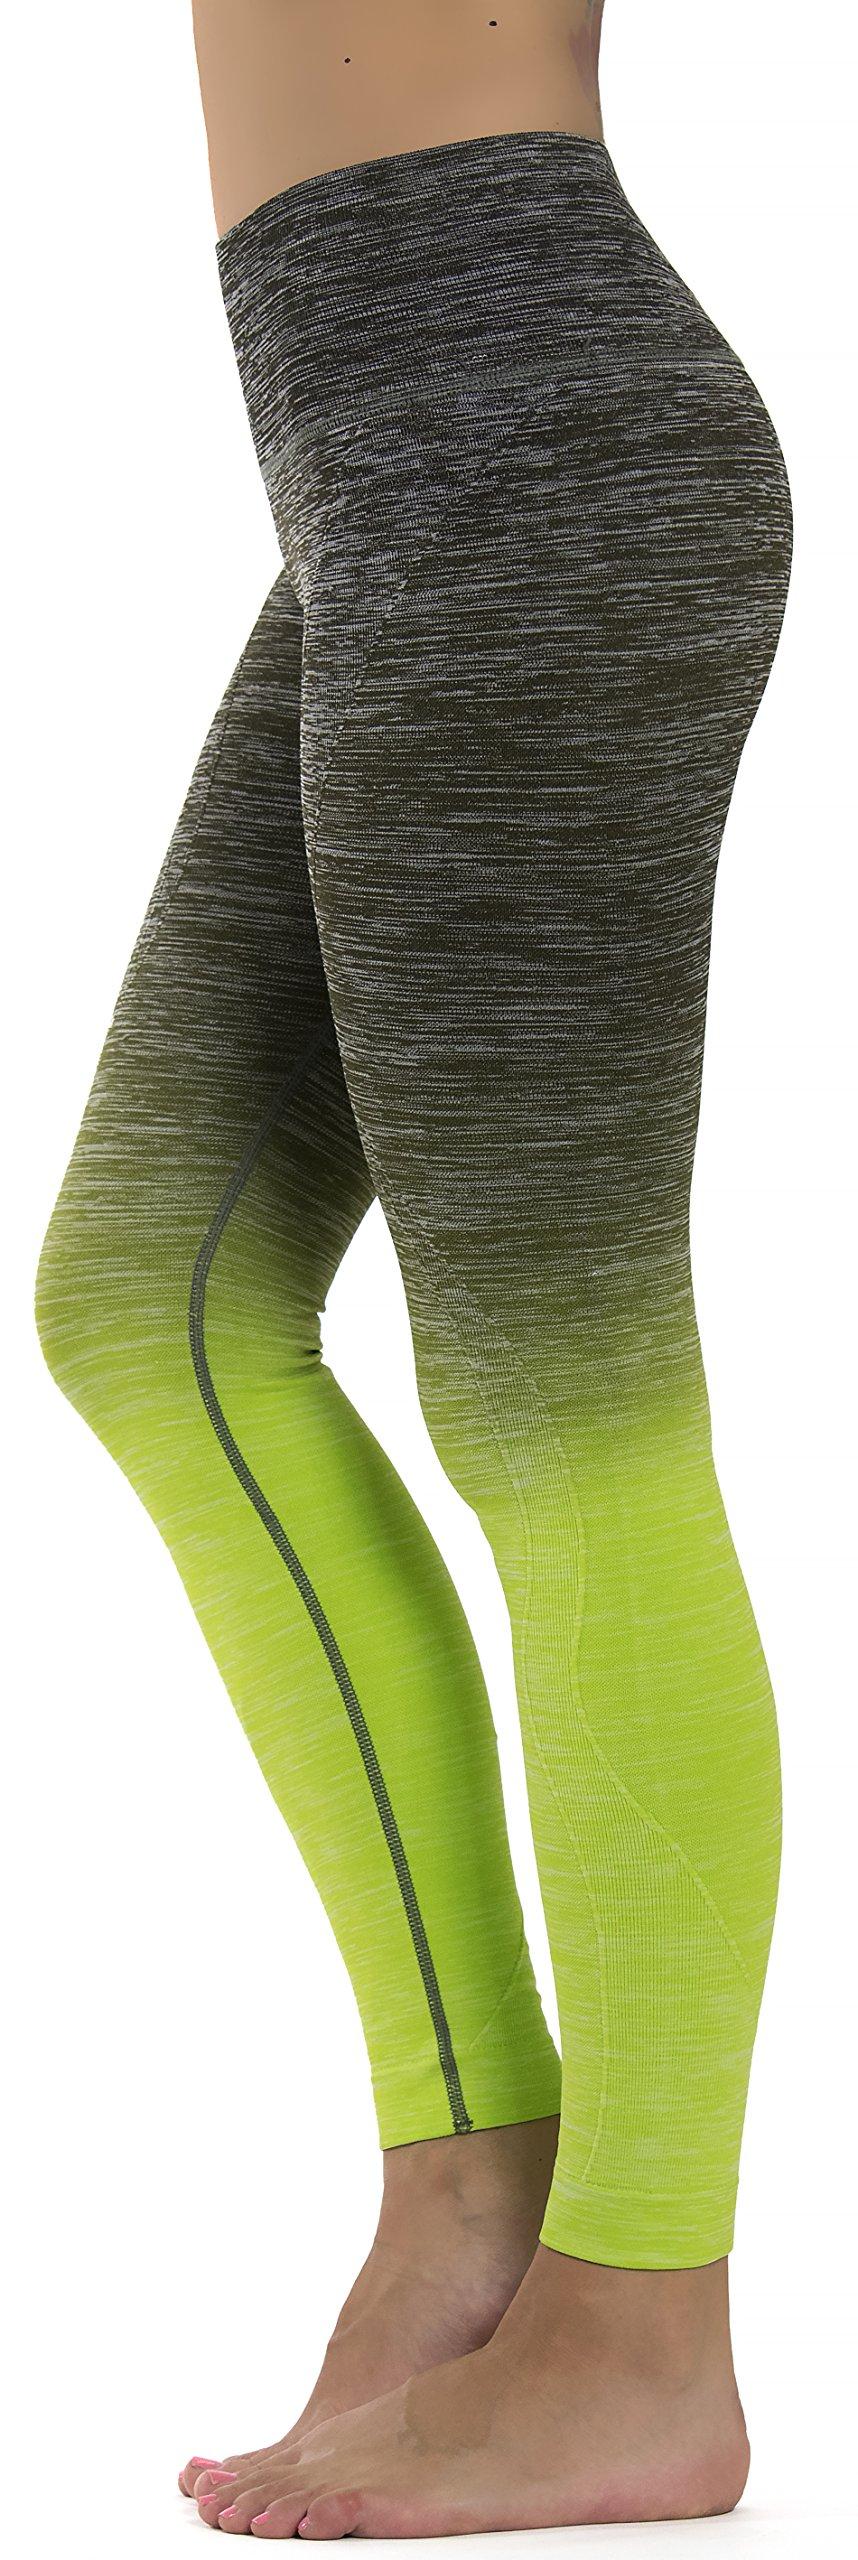 Prolific Health Fitness Power Flex Yoga Pants Leggings XS - XL (X-Large, Kale/Neon Green)